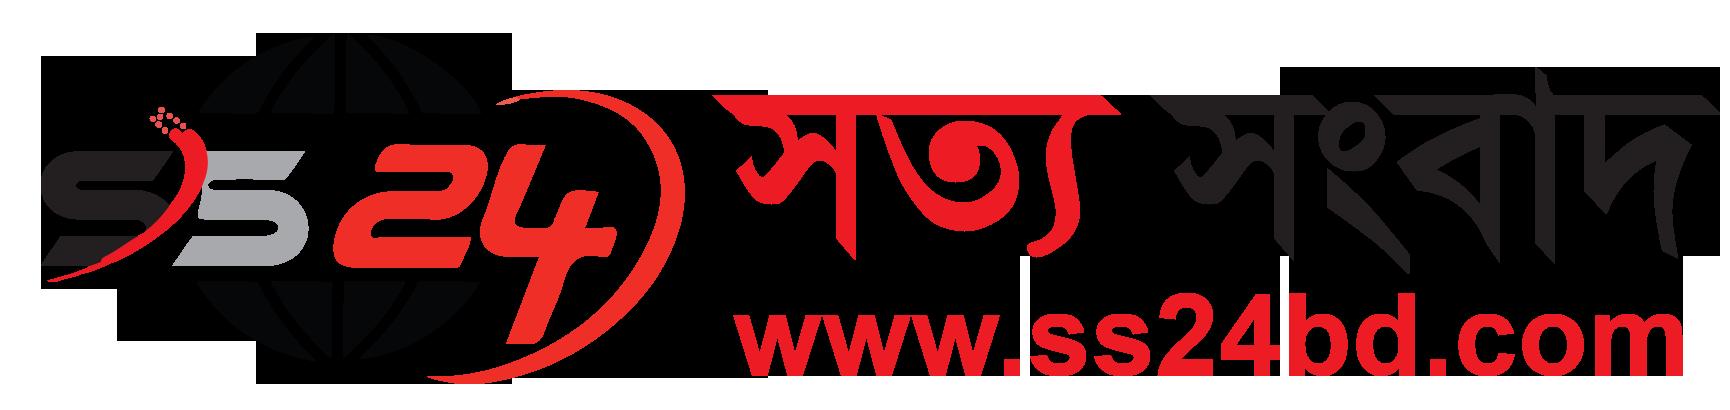 www.ss24bd.com